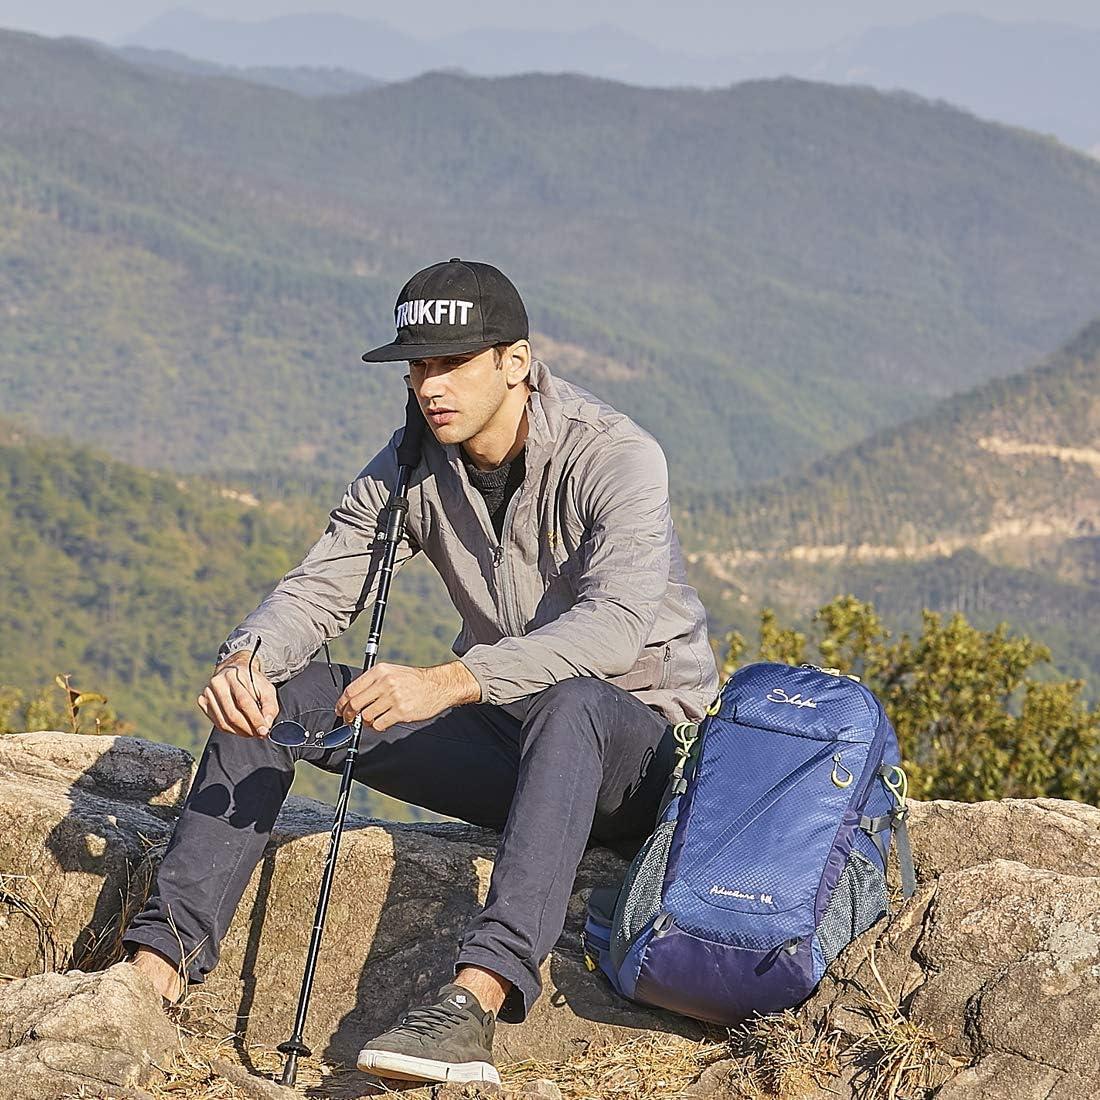 Internal Frame Backpack Travel Backpack for Men Women Camping Dokoclub Waterproof Hiking